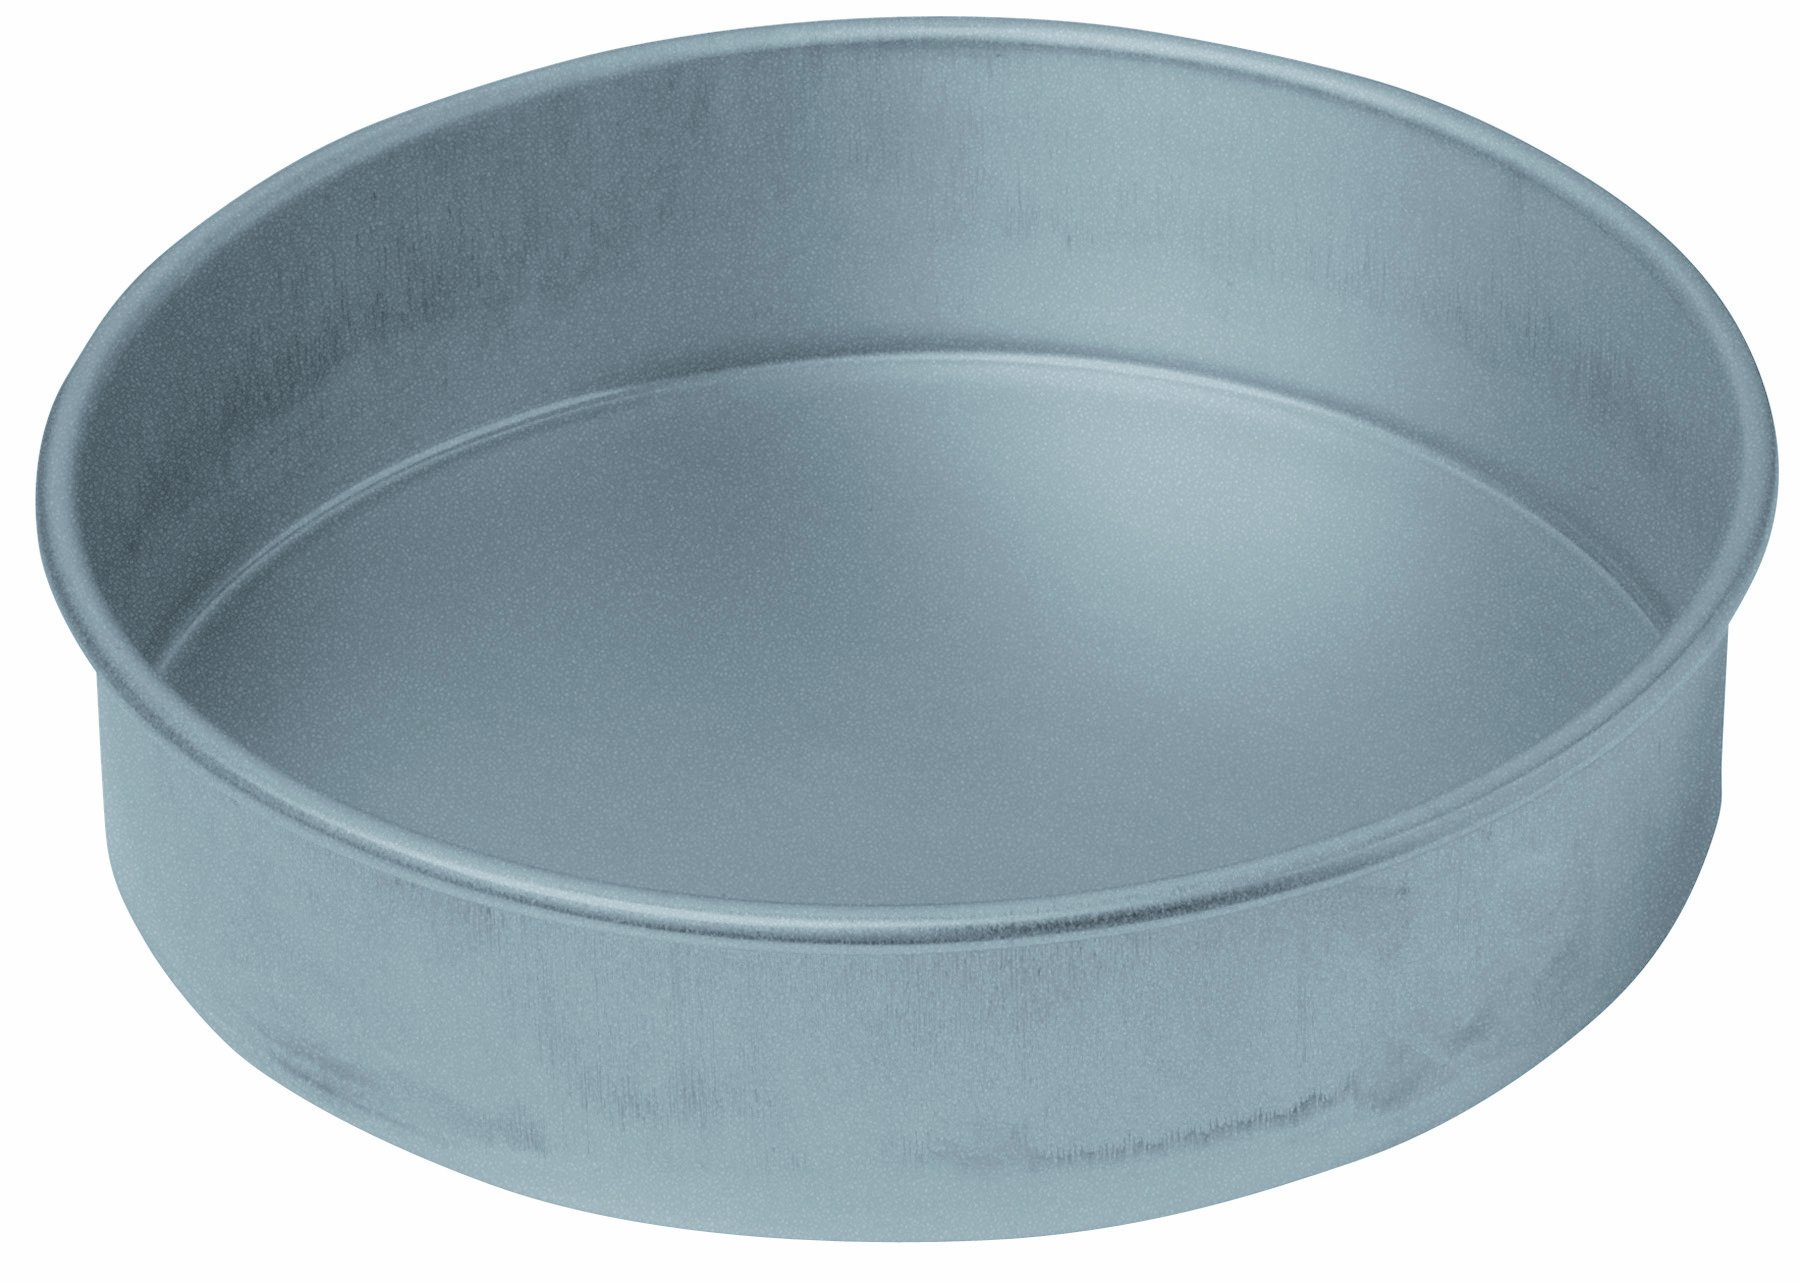 Chicago Metallic Commercial II Non-Stick Round Cake Pan